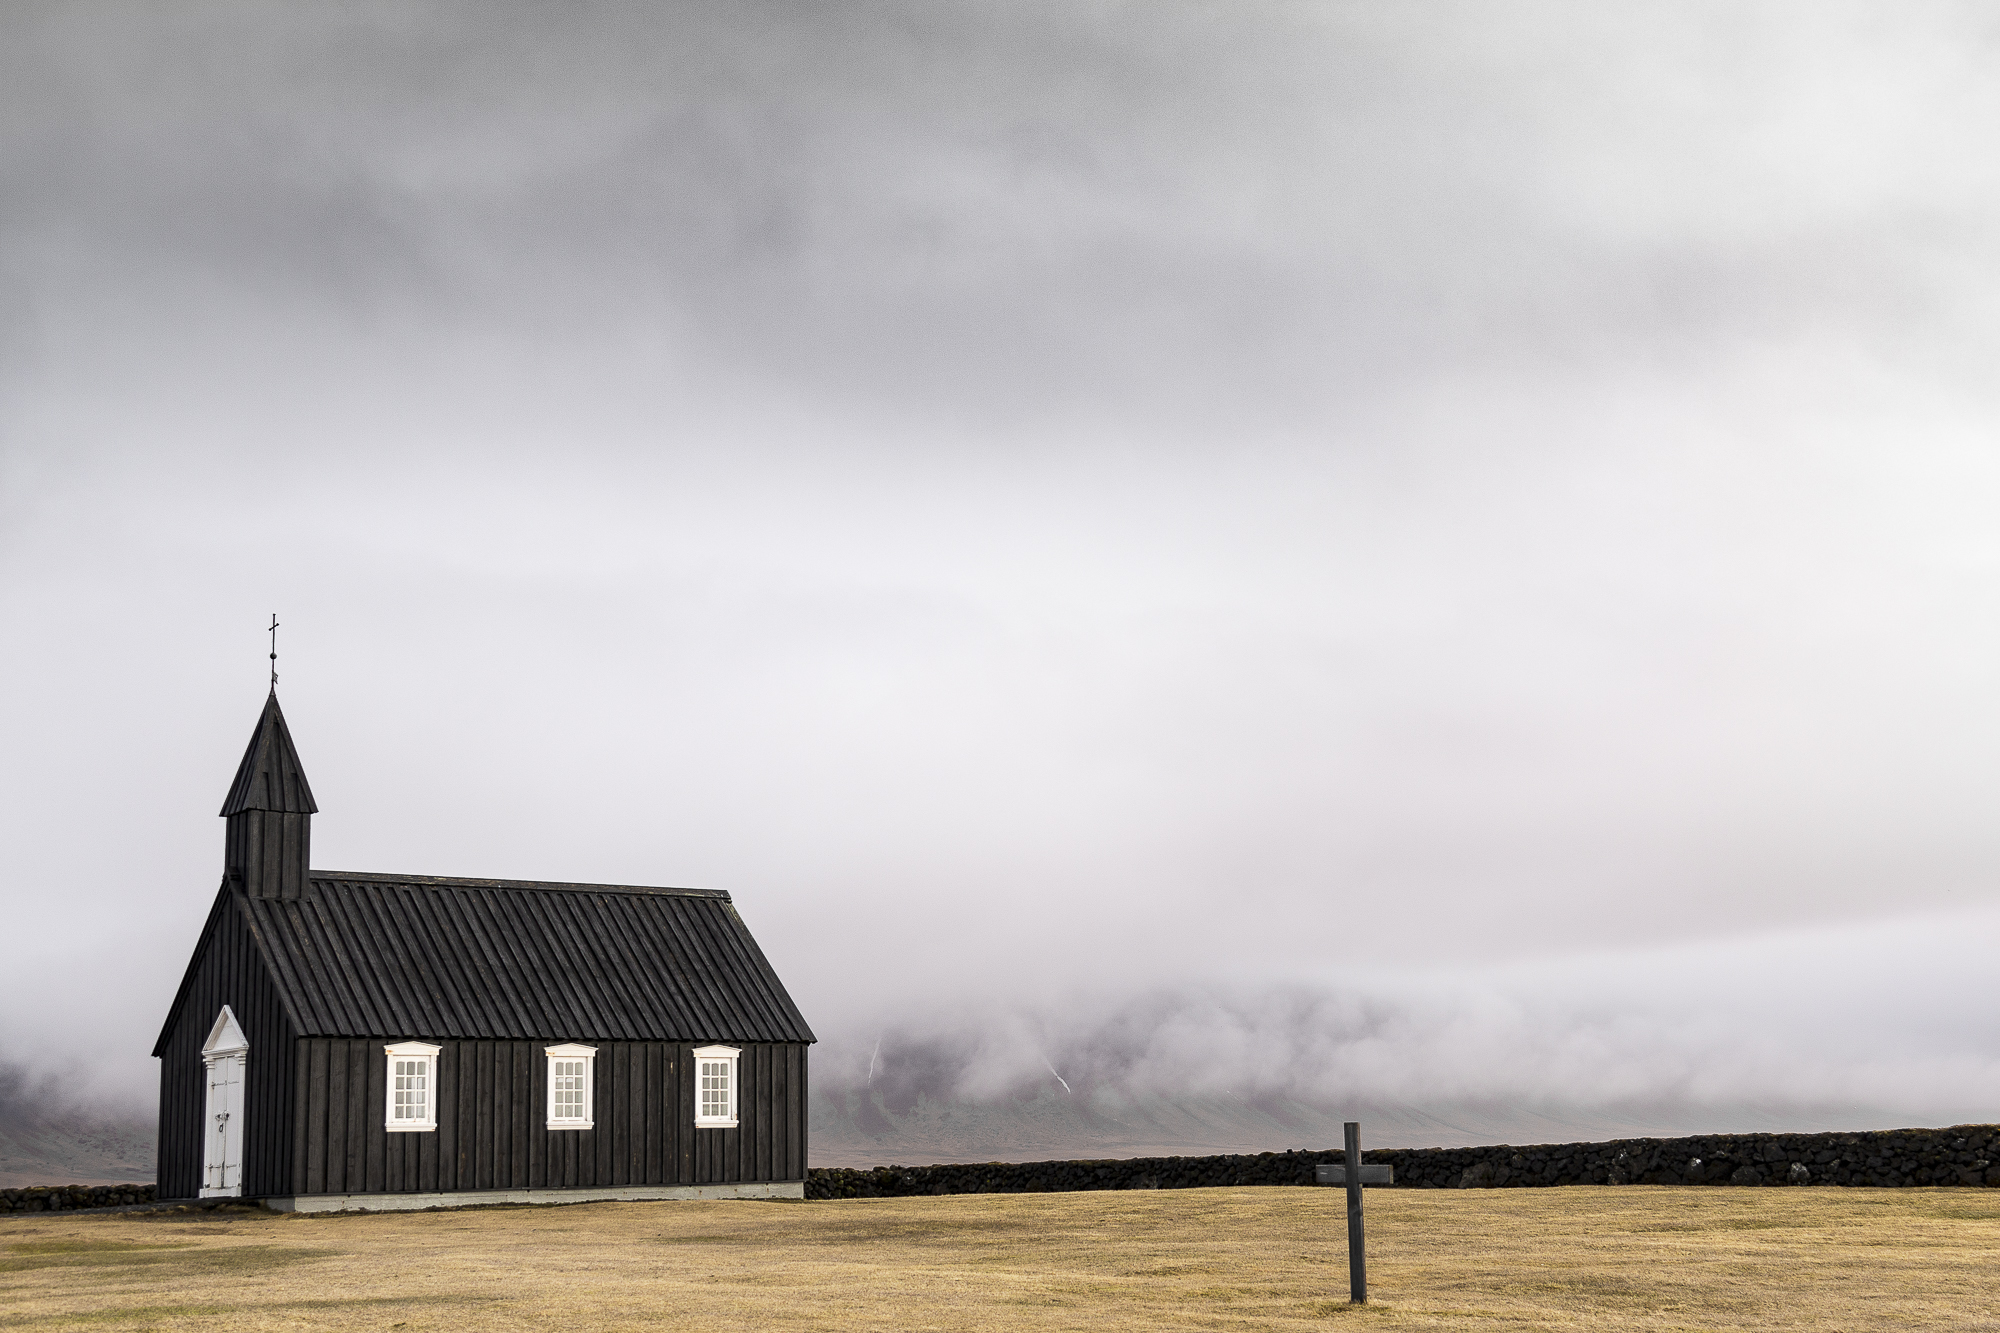 Ankit_Iceland-9943.jpg